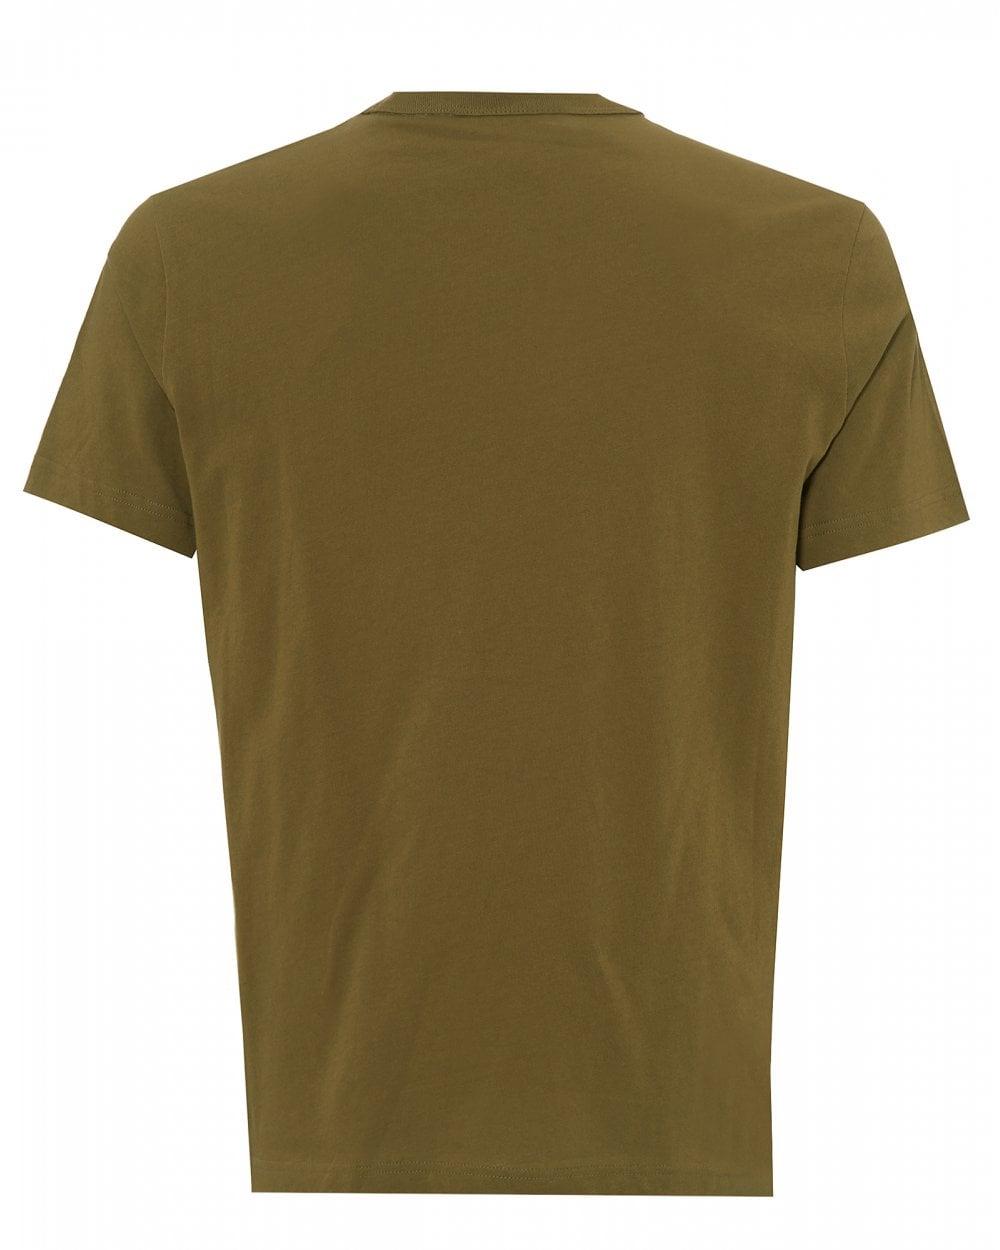 37fdfc3ee8fe Champion Olive White Small Script T-Shirt, Logo Tee